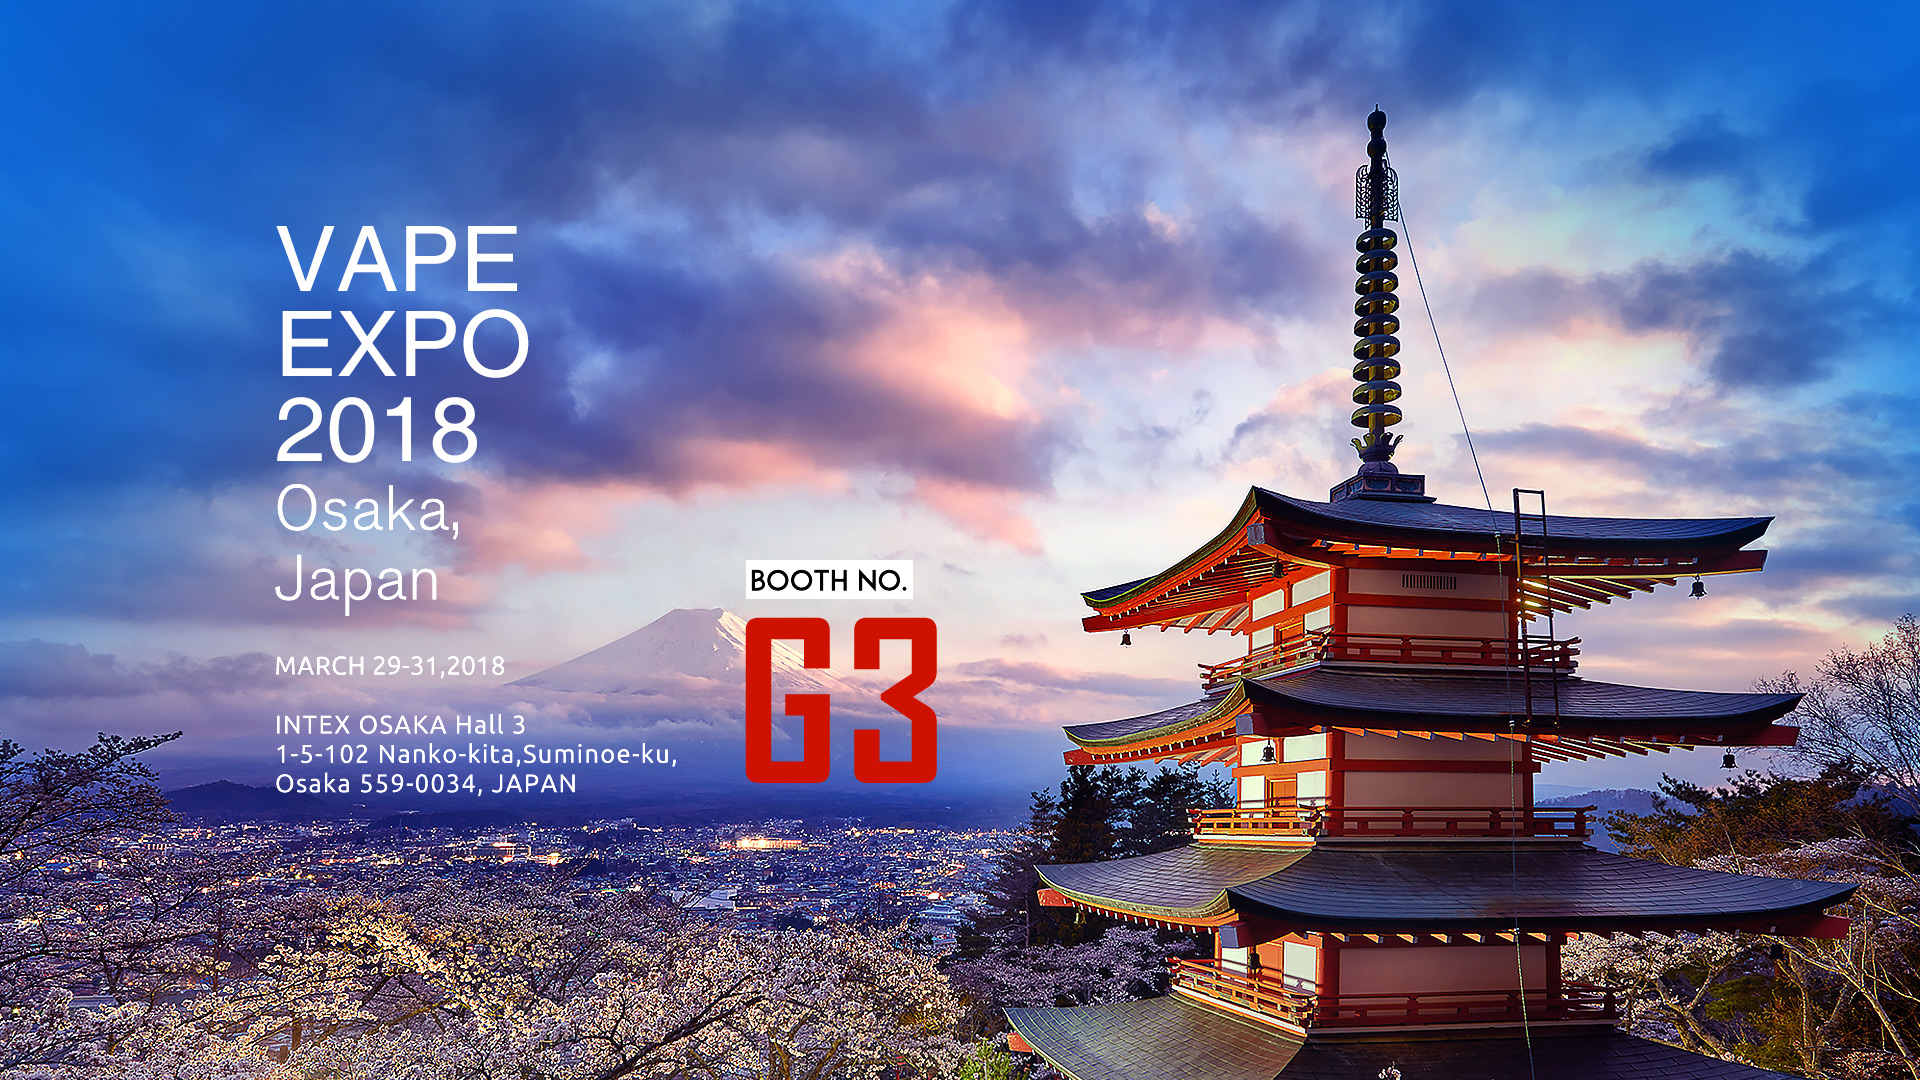 Vape Expo Japan